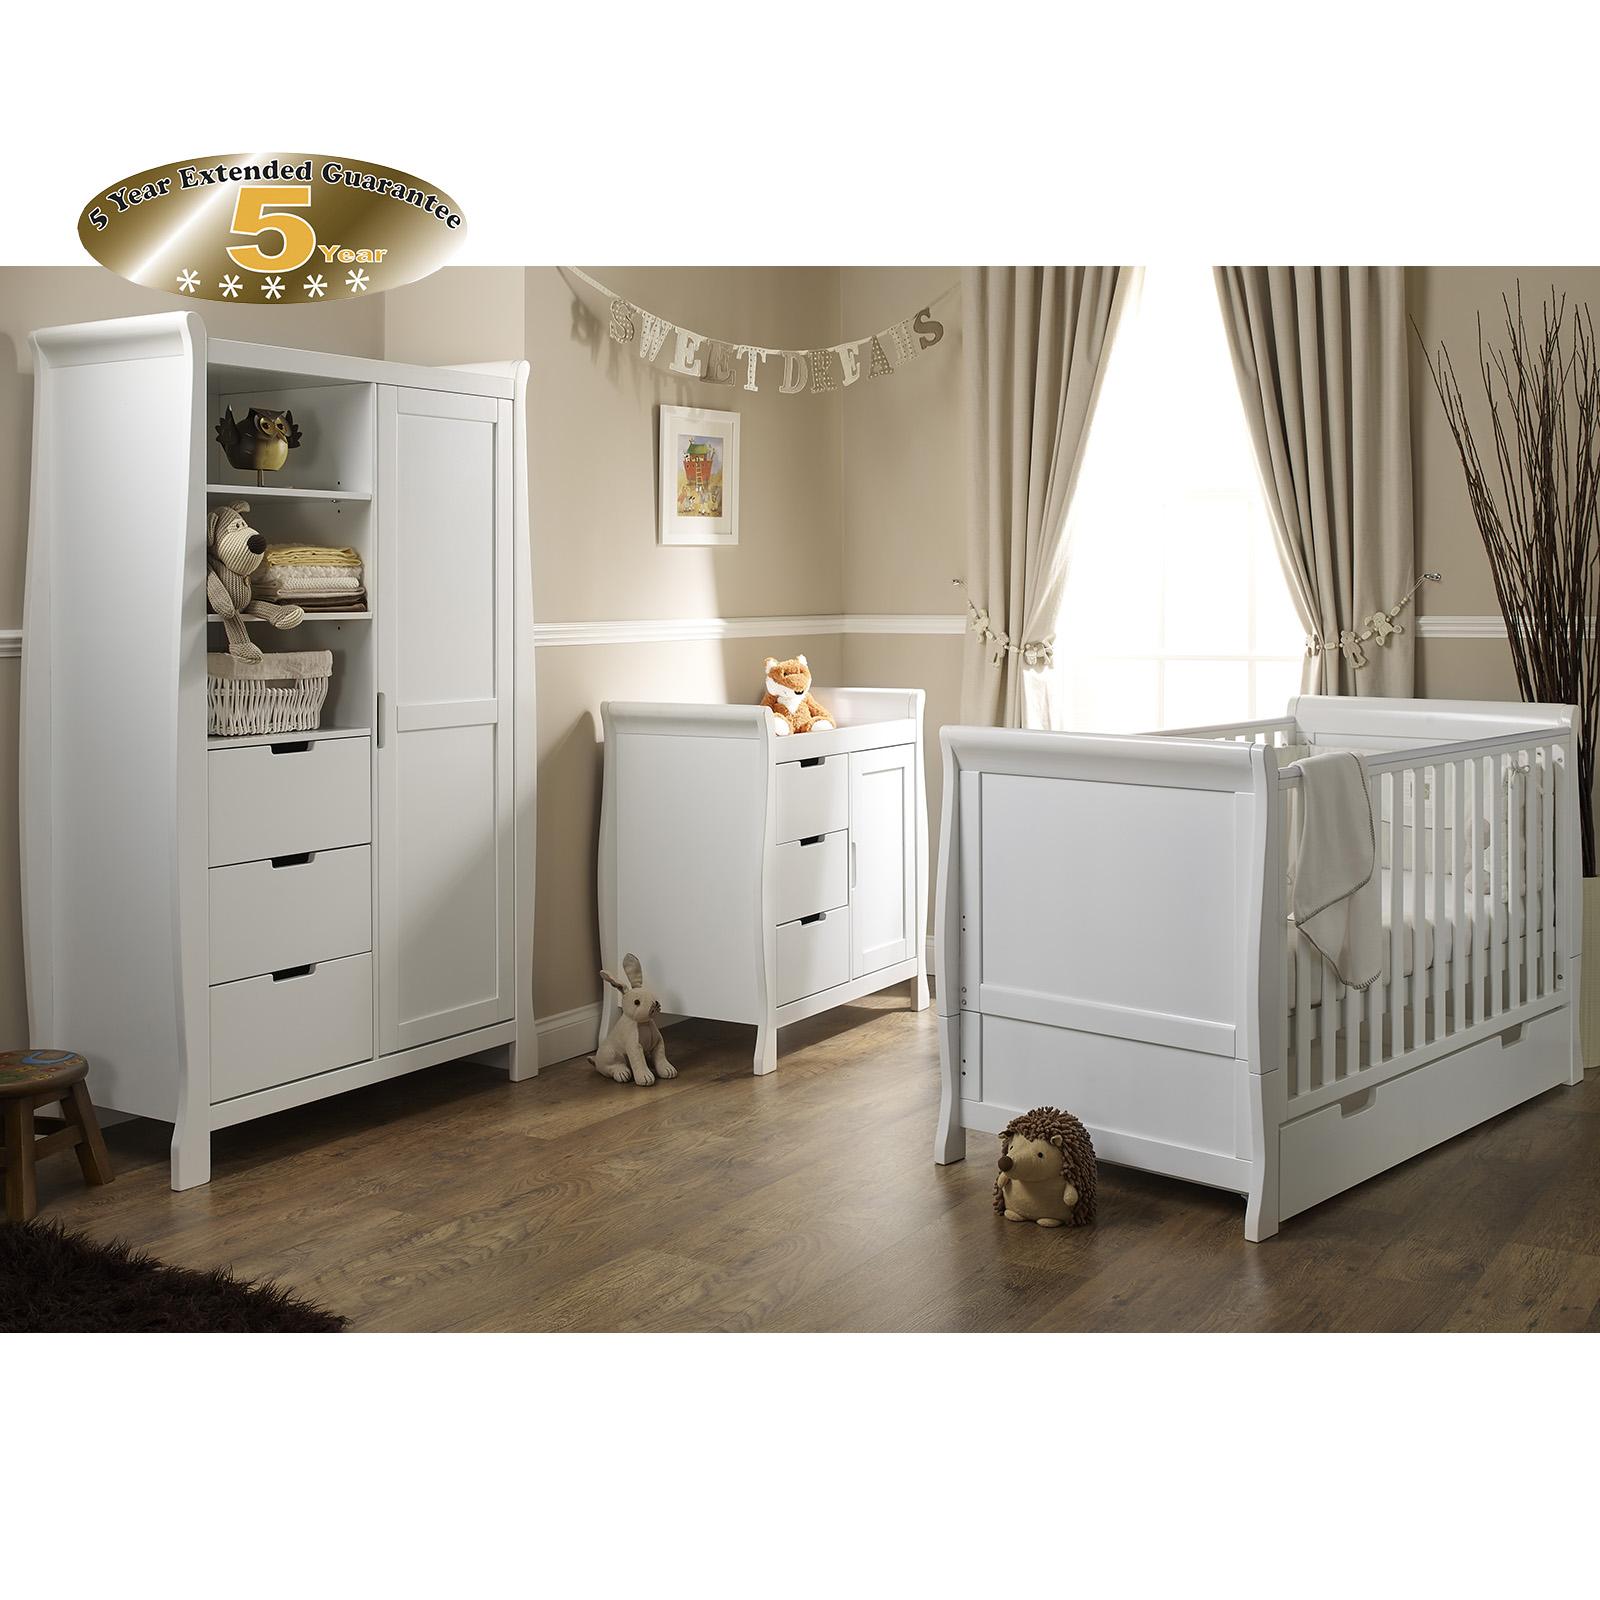 Obaby Stamford Classic Sleigh 3 Piece Nursery Room Set